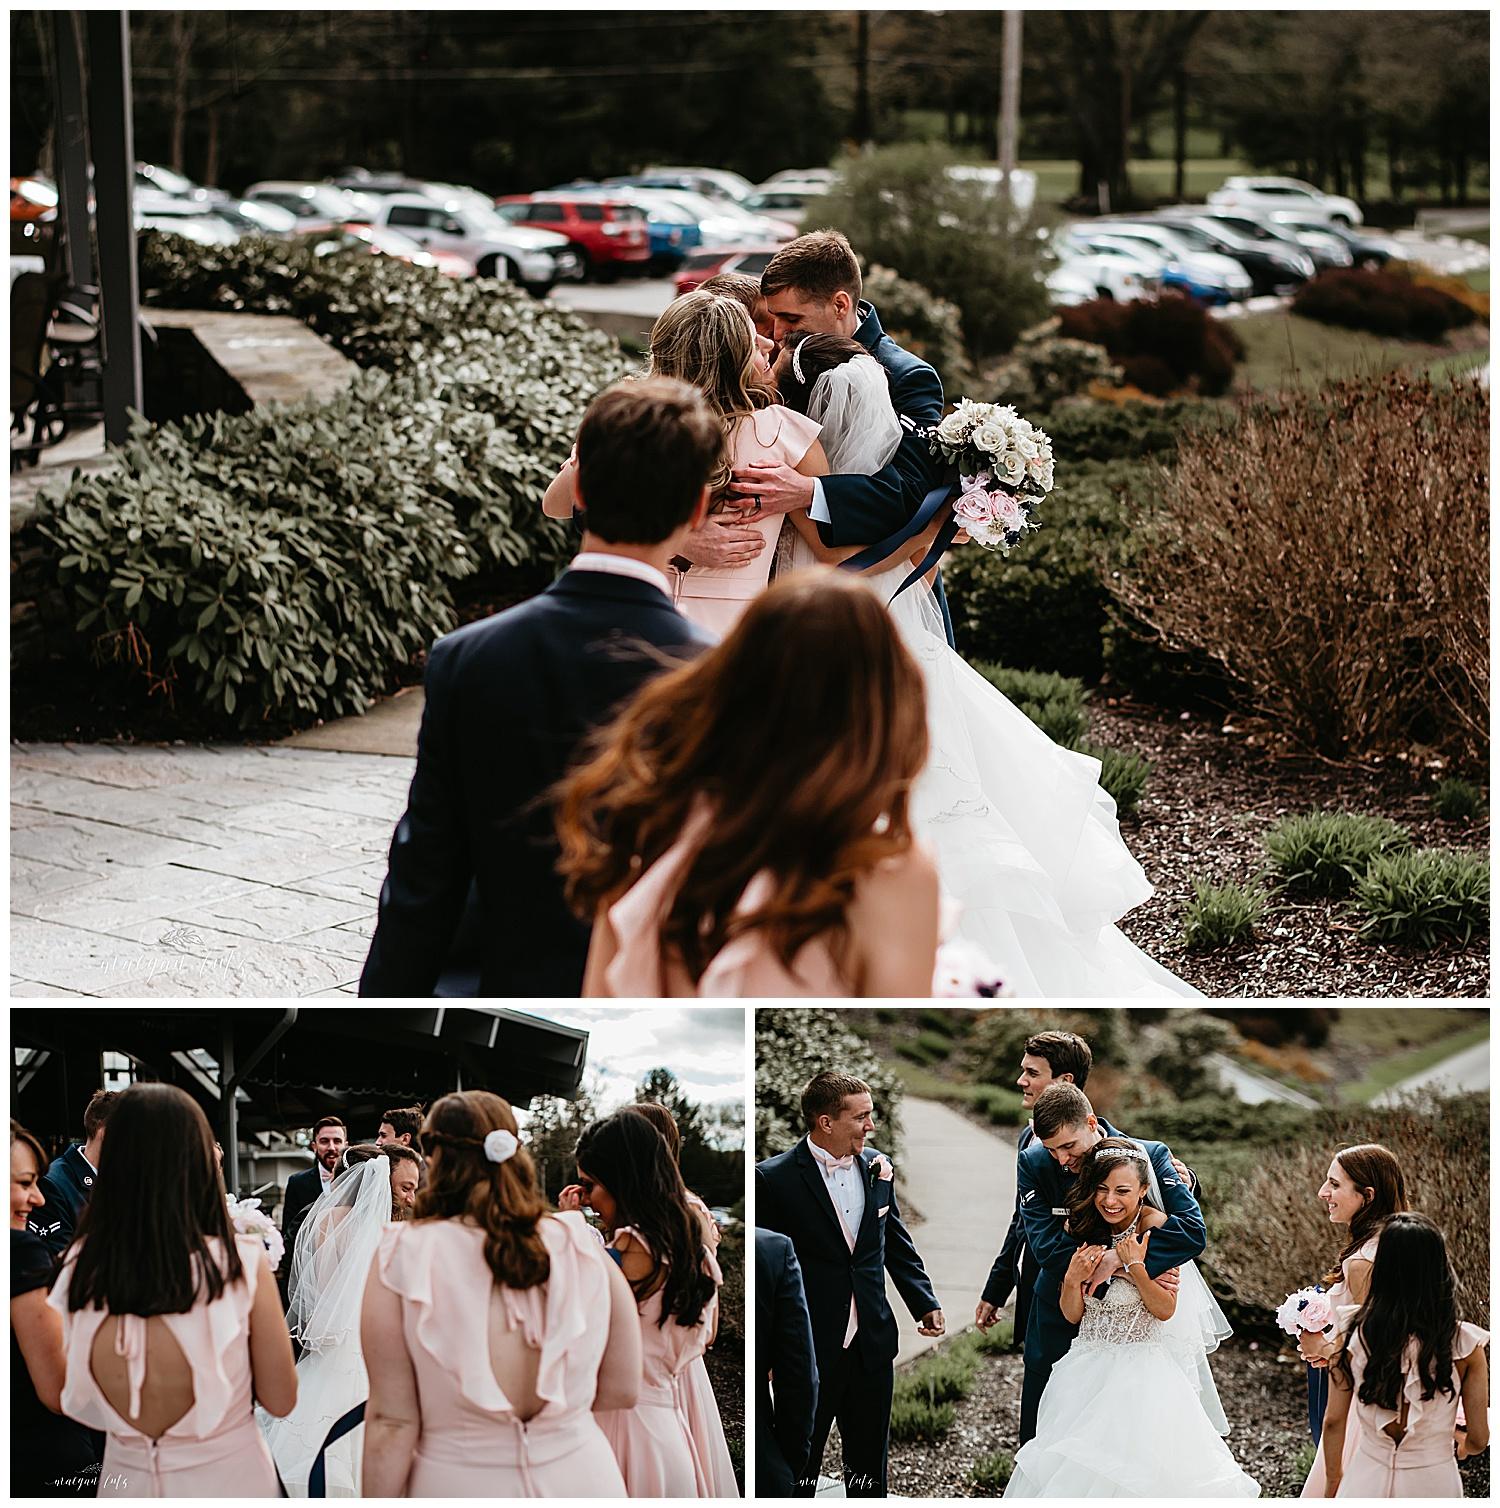 NEPA-Lehigh-Valley-Wedding-Photographer-at-Glen-Oak-Country-Club-Clarks-Summit-PA_0048.jpg